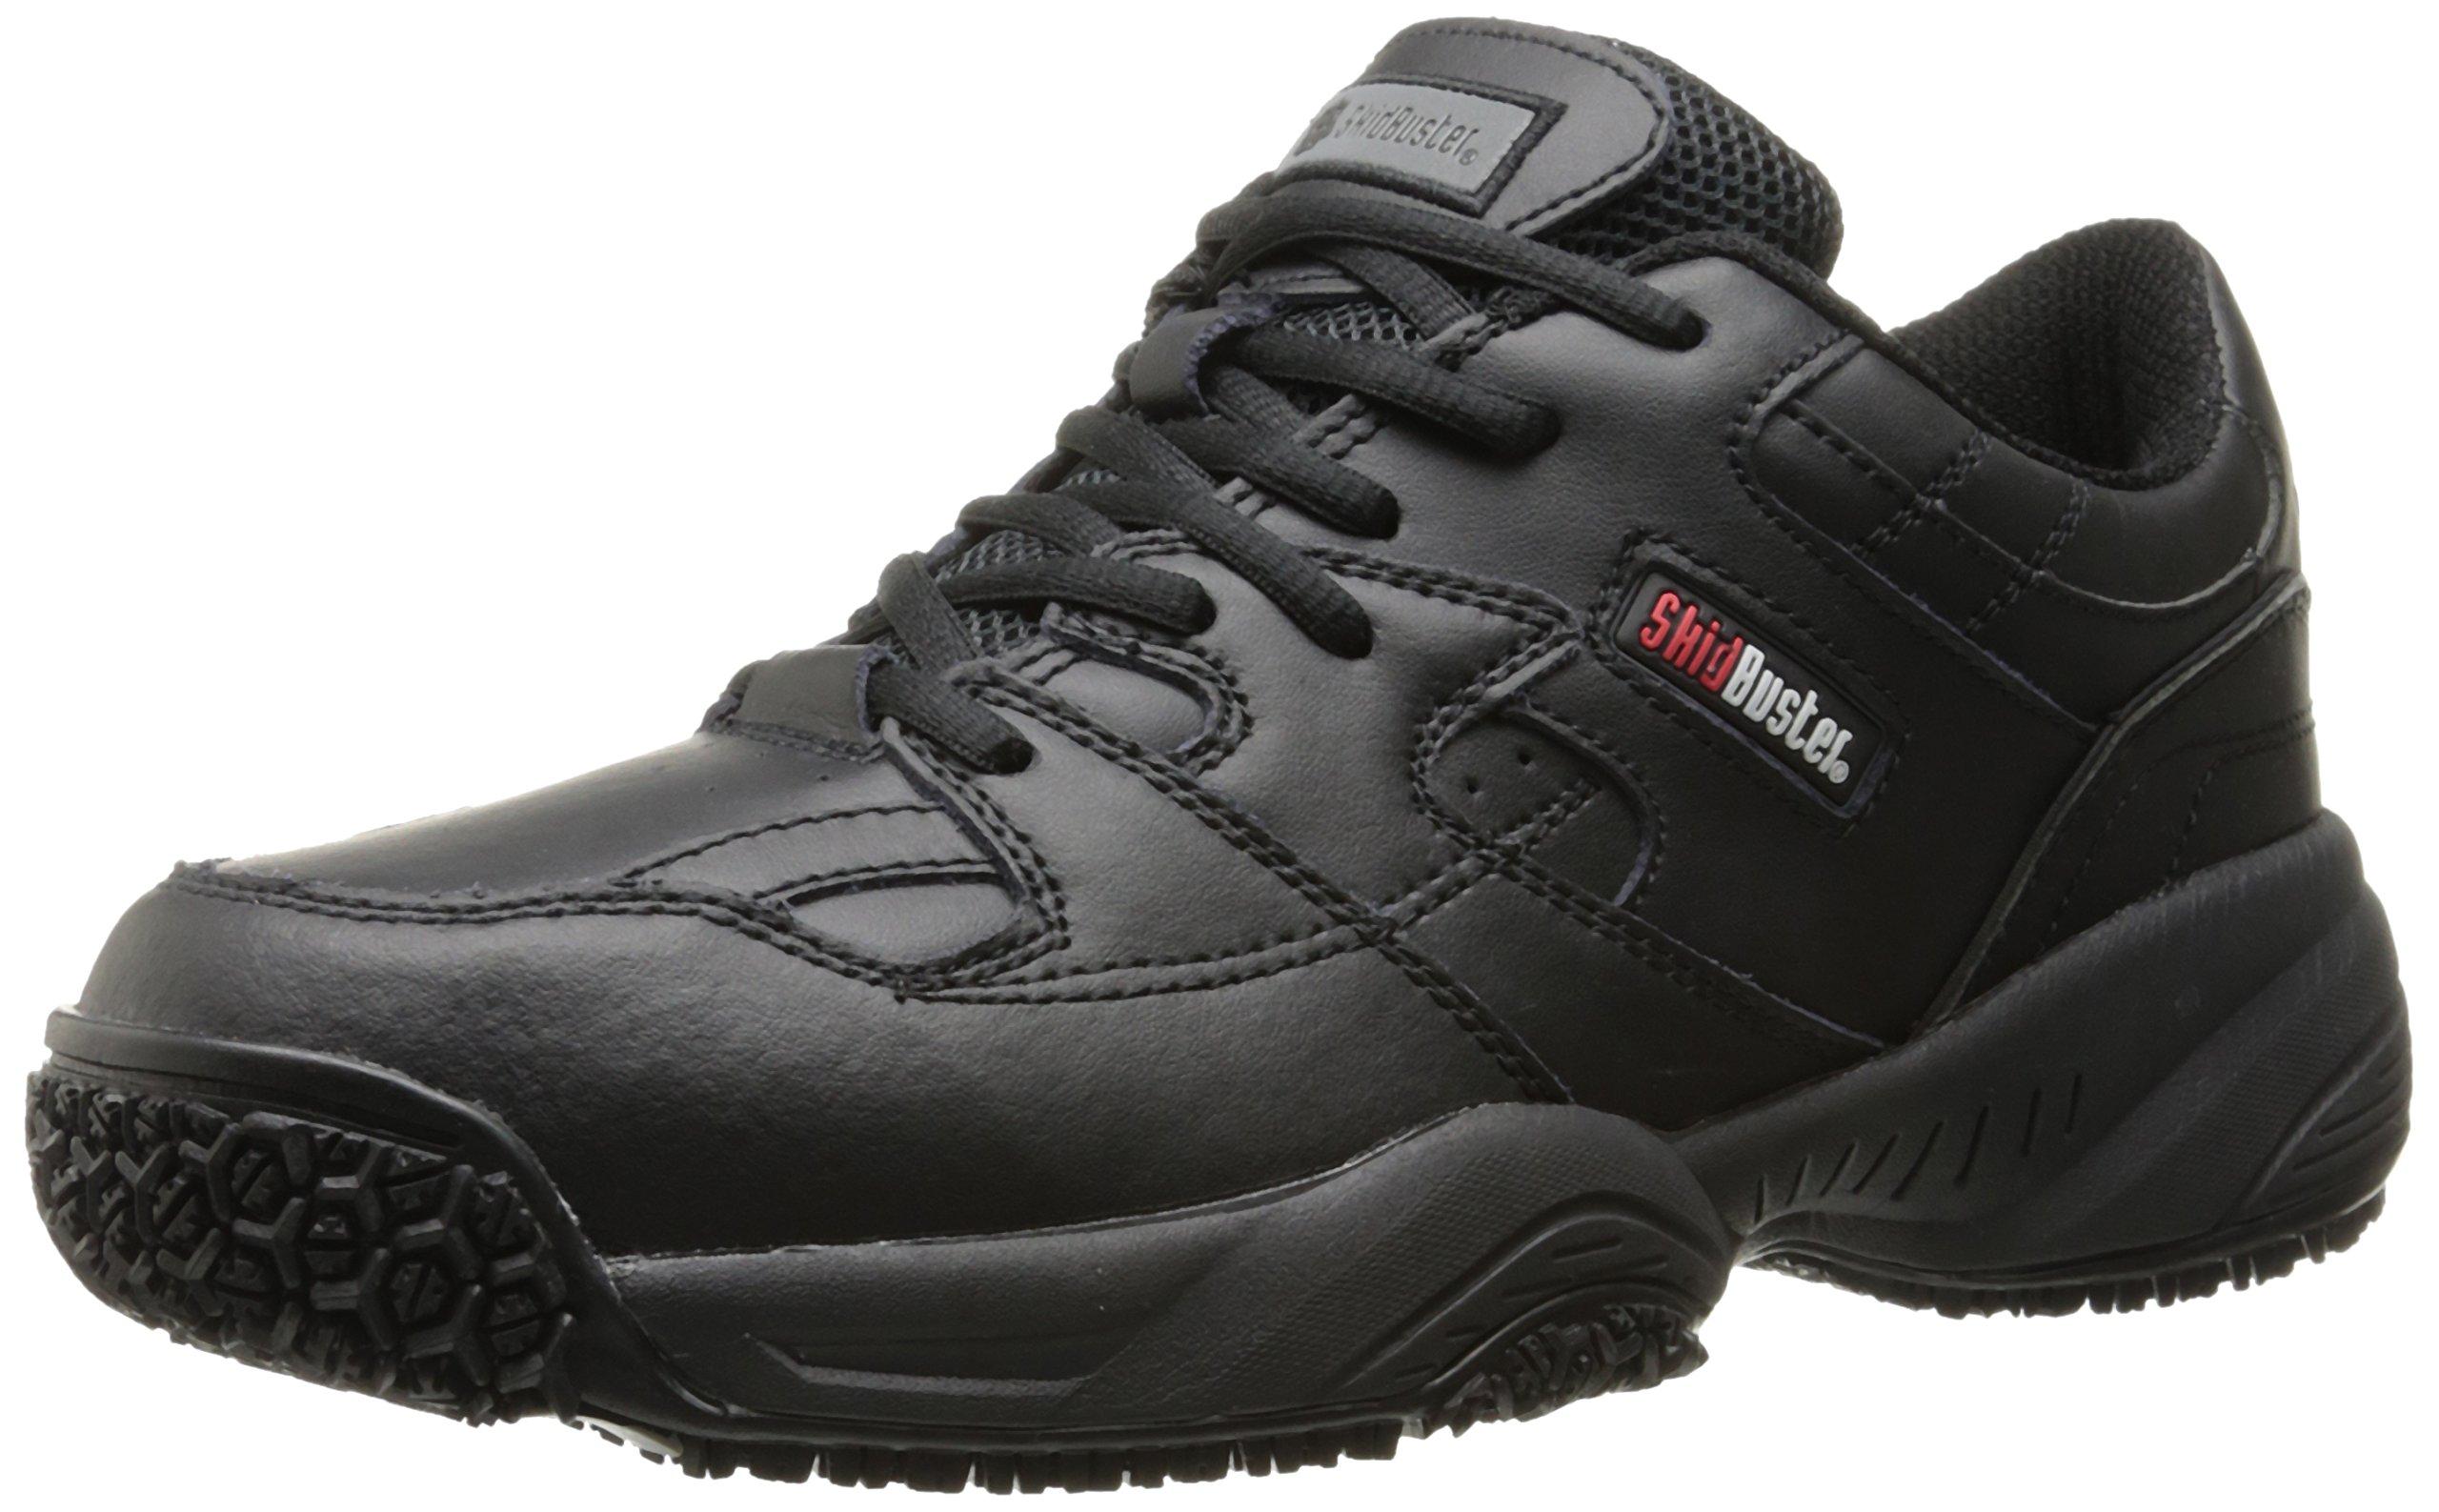 Skidbuster 5050 Men's Leather Comfort Slip Resistant Athletic Shoe,Black,12 W US